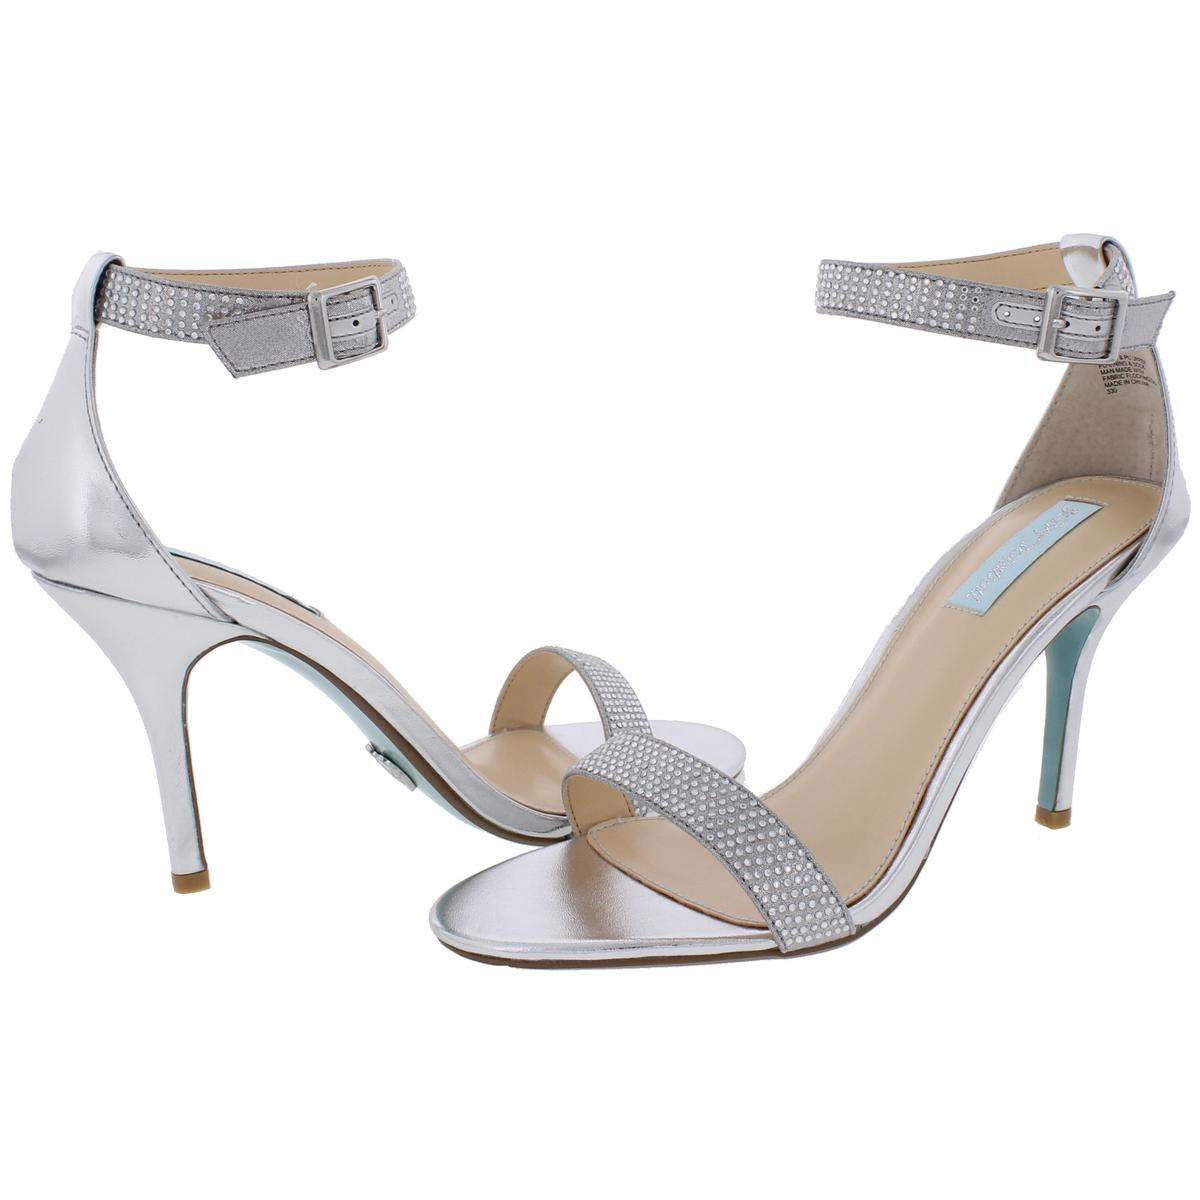 f4a99965fc9 Blue by Betsey Johnson Womens Shilo Studded Heels Dress Sandals ...